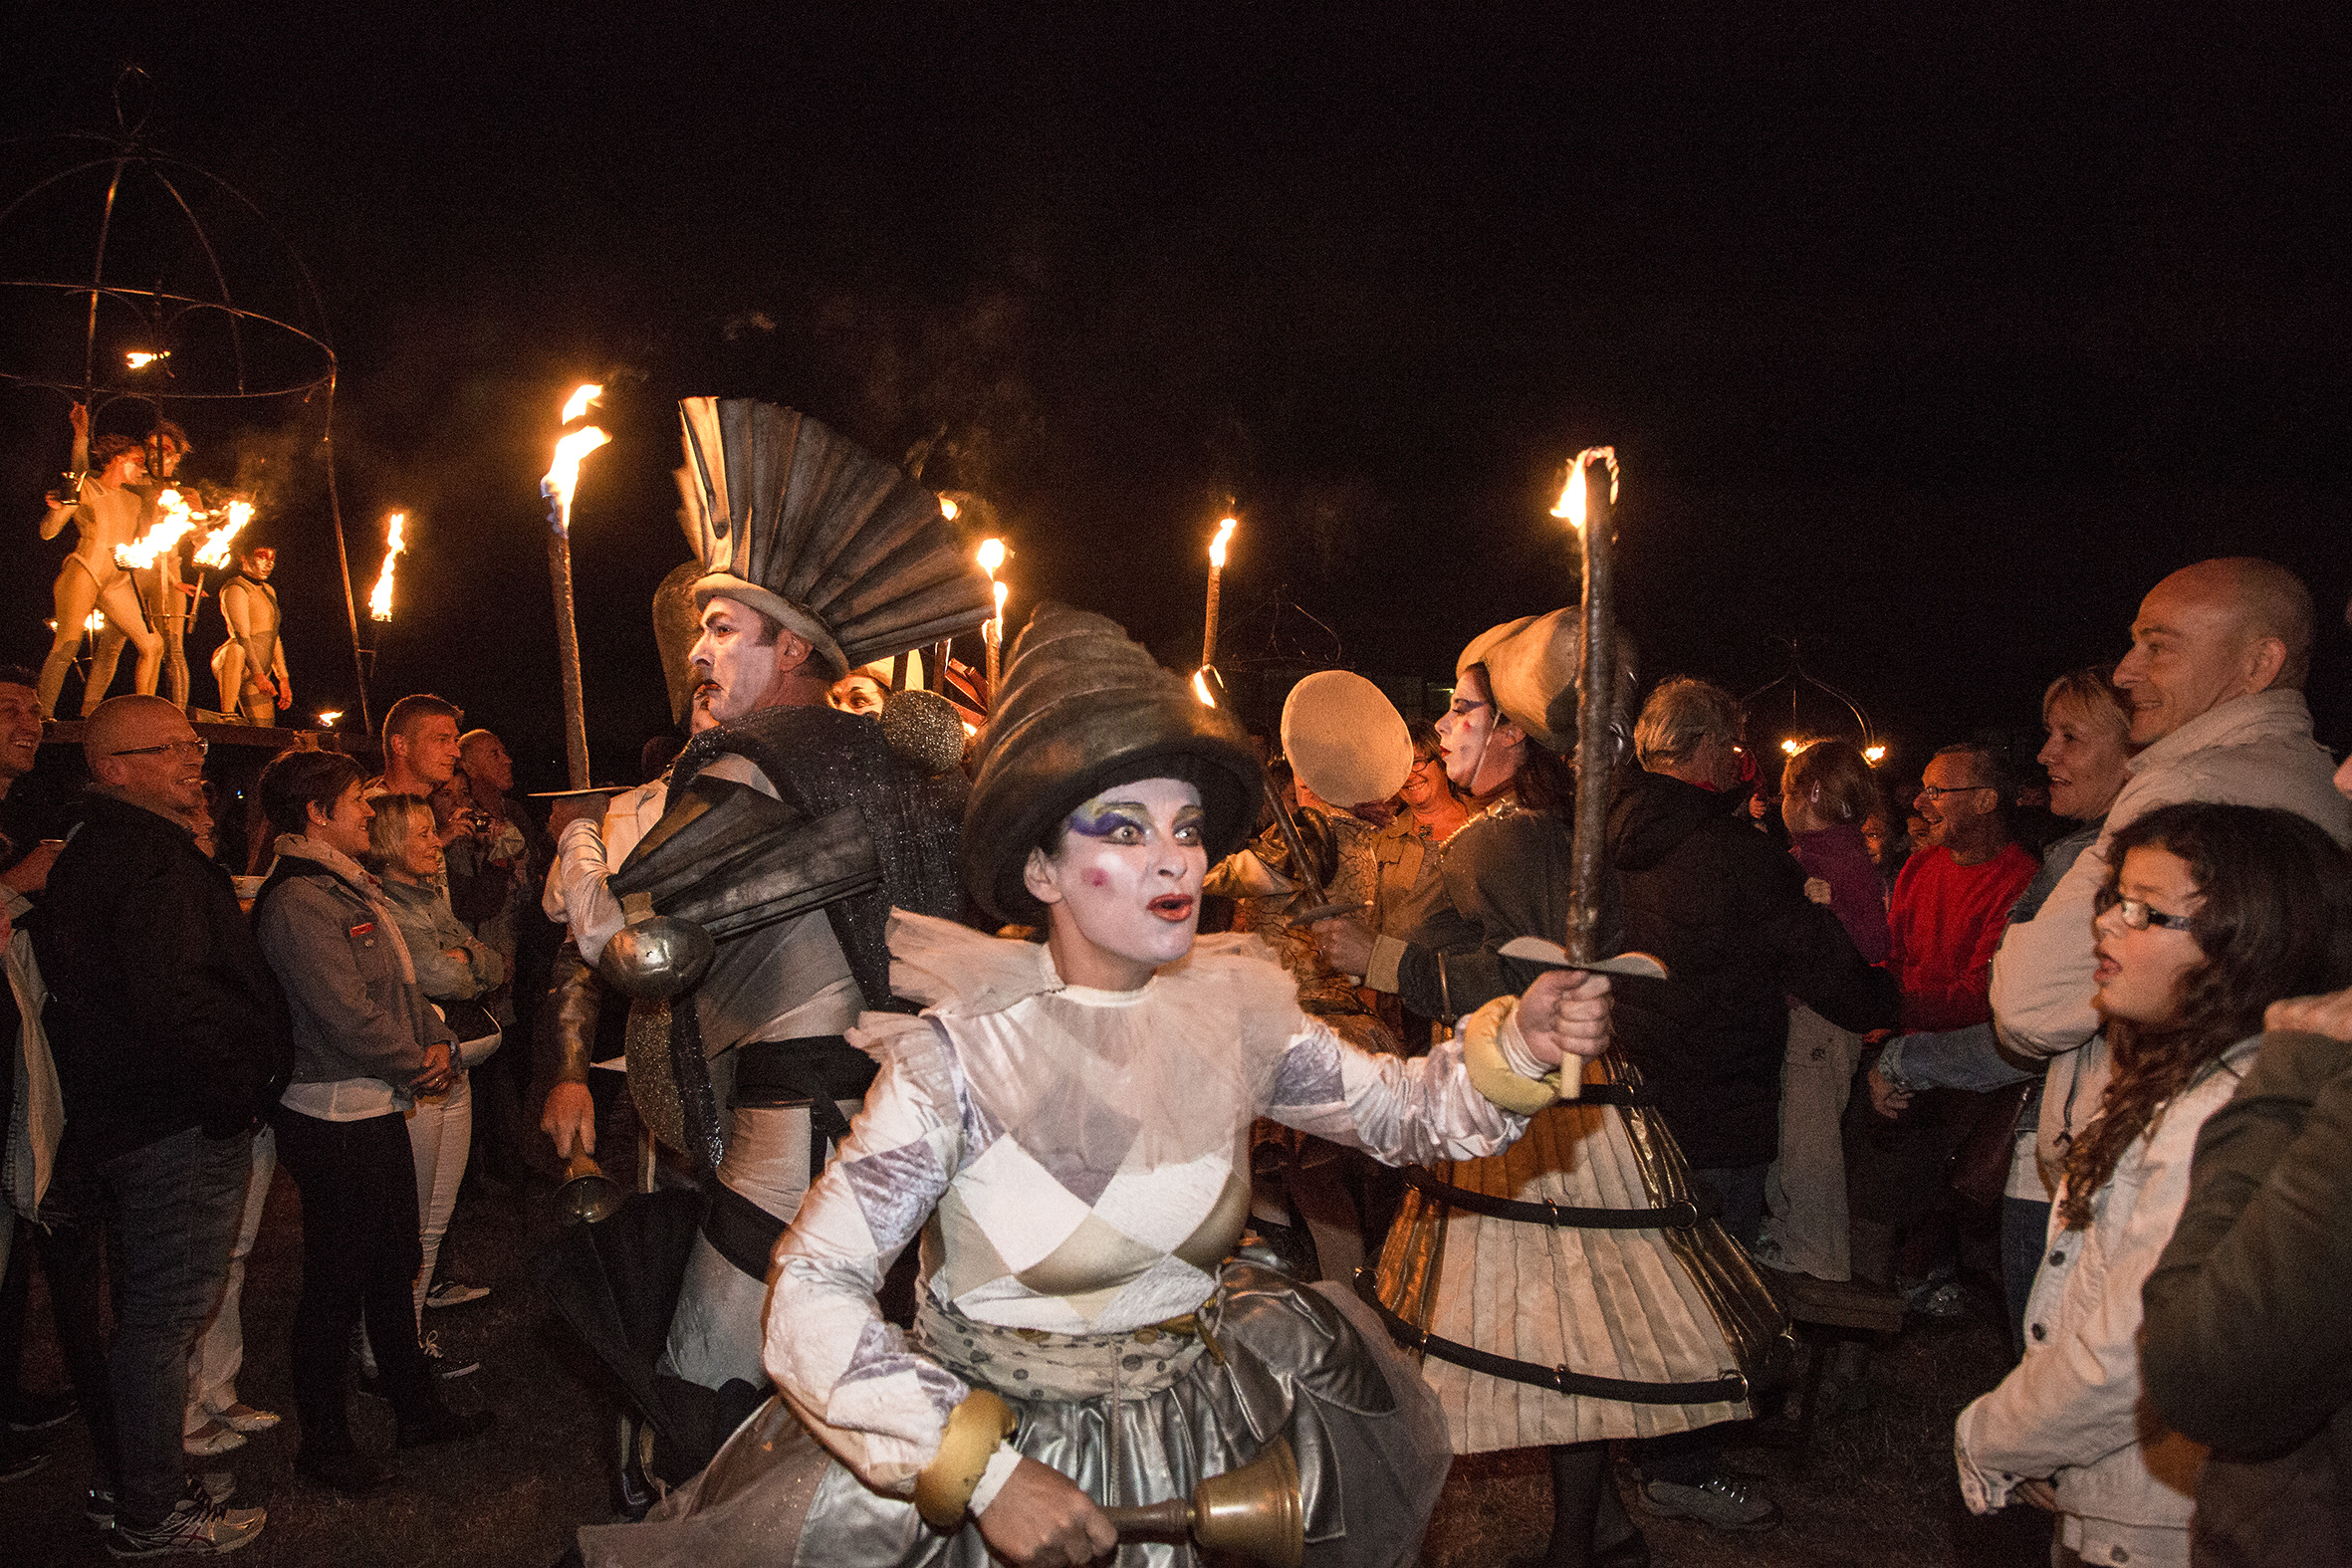 festival-la-sarre-a-contes-maudits-sonnants-sarralbe-2015-08-marie-colette-becker-009